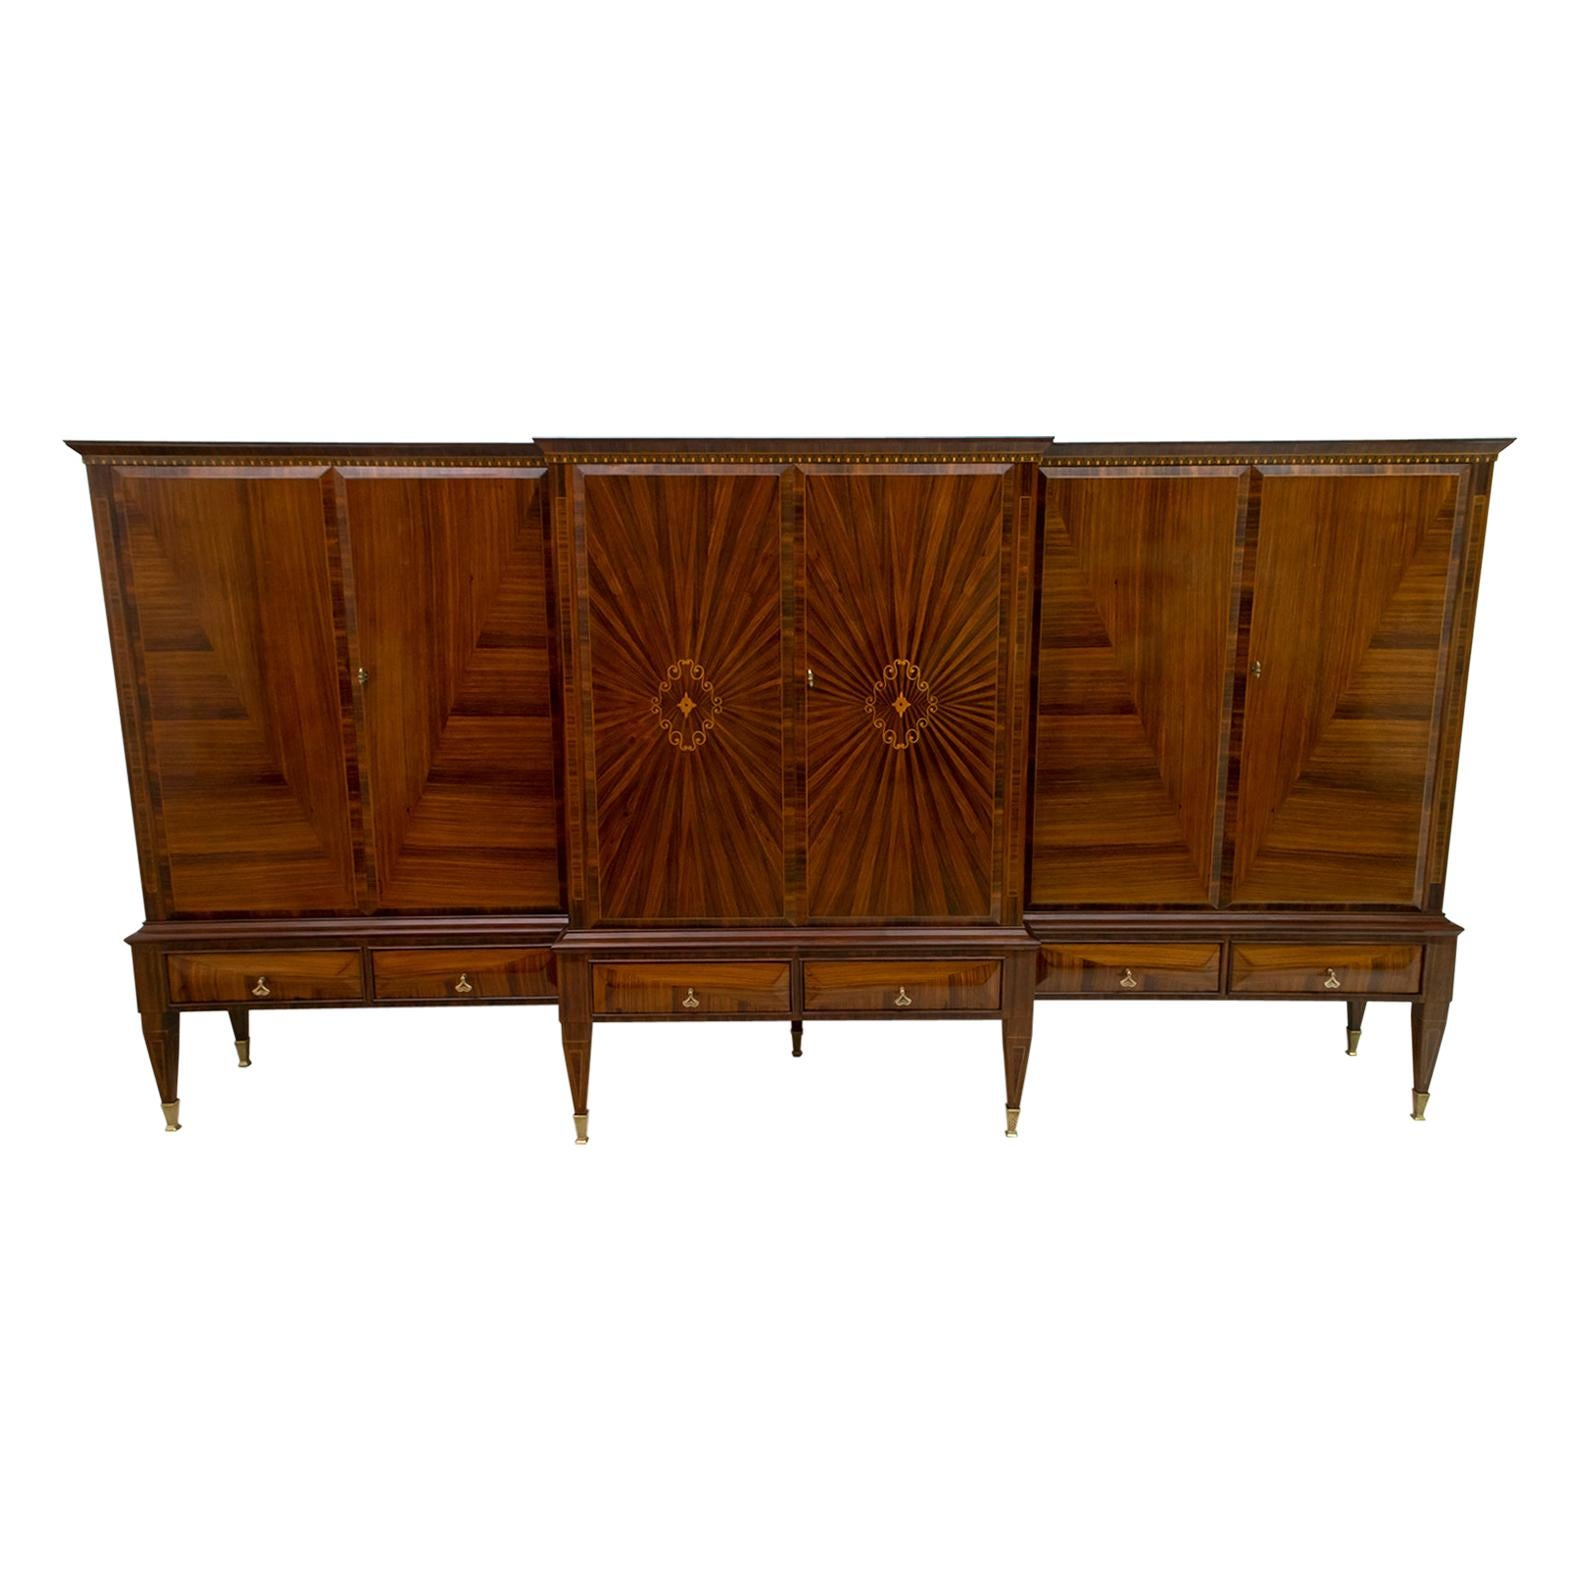 Paolo Buffa Mid-Century Modern Italian Maple Inlay Sideboard Cabinet Bar, 1950s